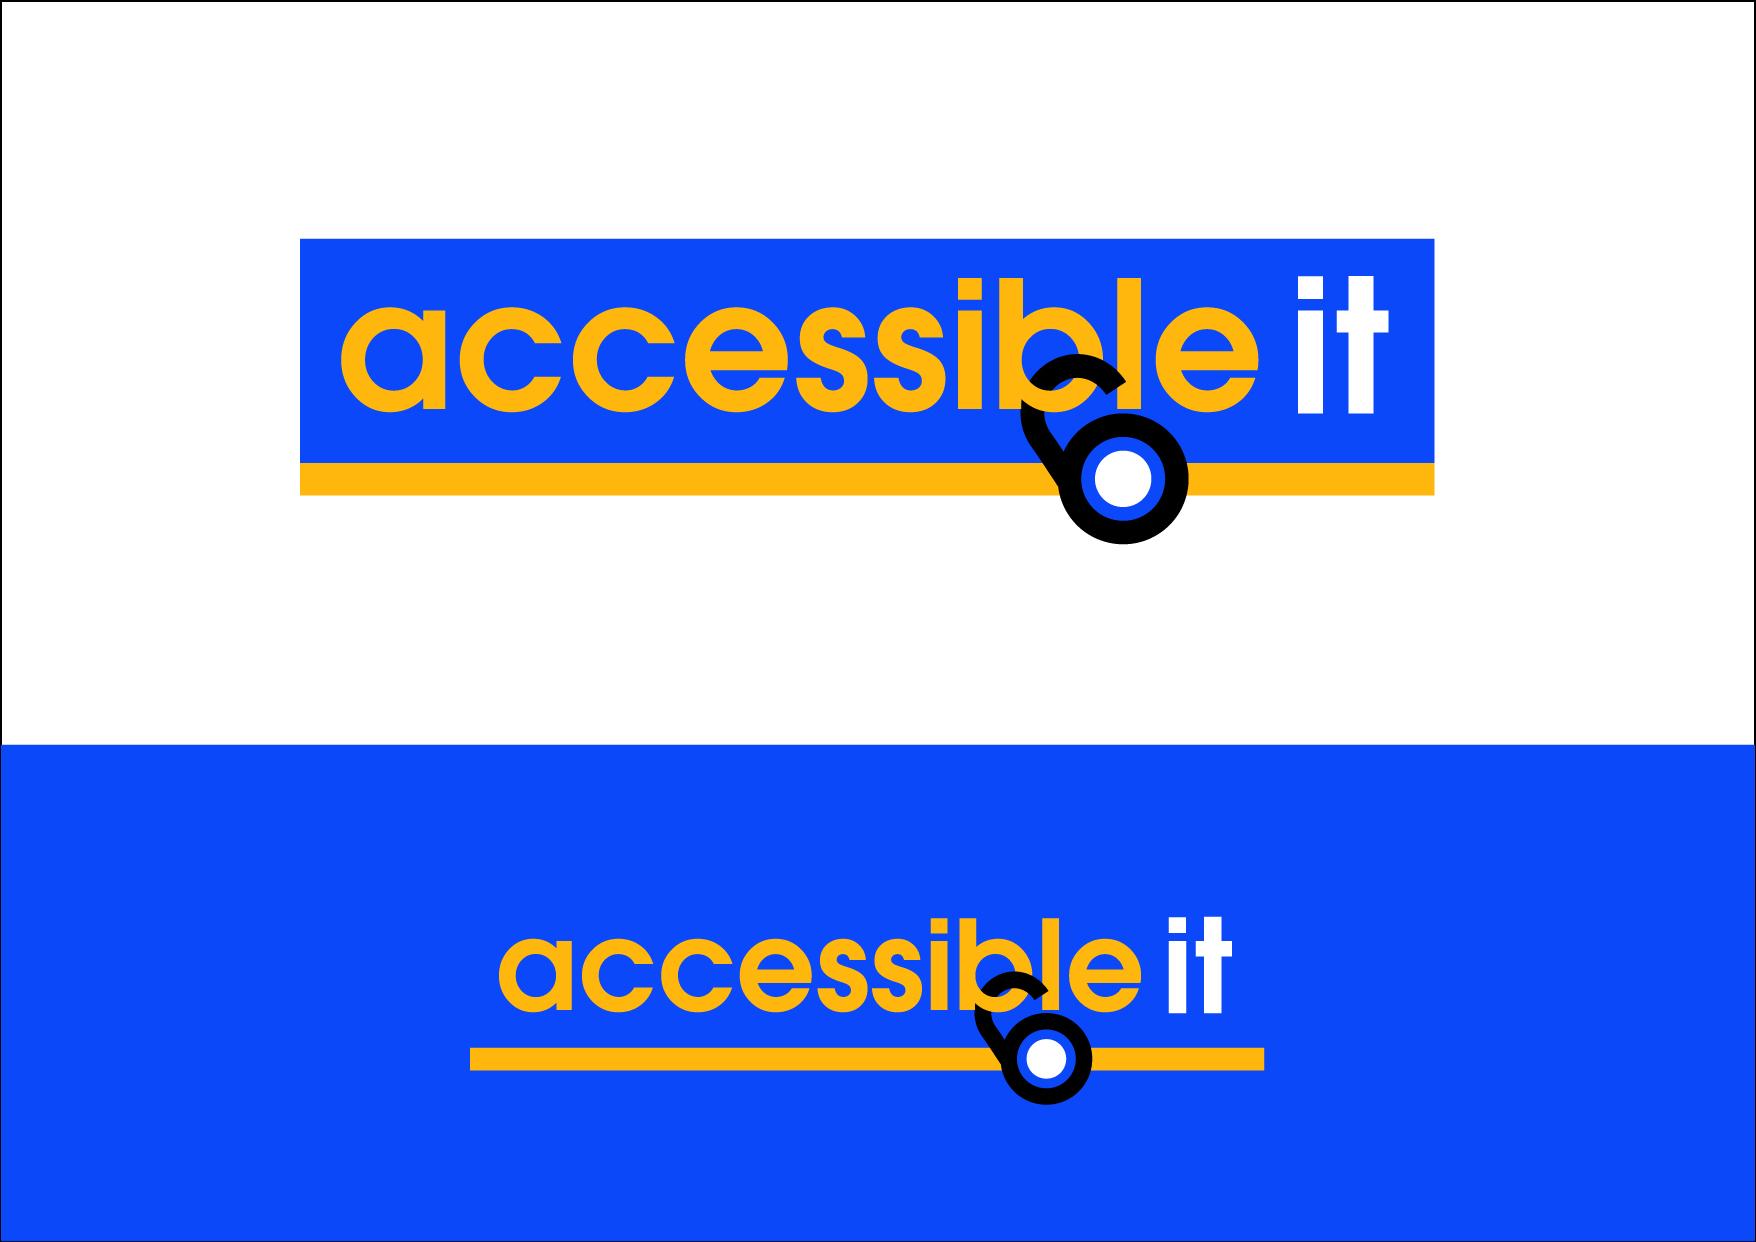 Logo Design by Wilfredo Mendoza - Entry No. 221 in the Logo Design Contest Logo Design Needed for Exciting New Company Accessible IT.